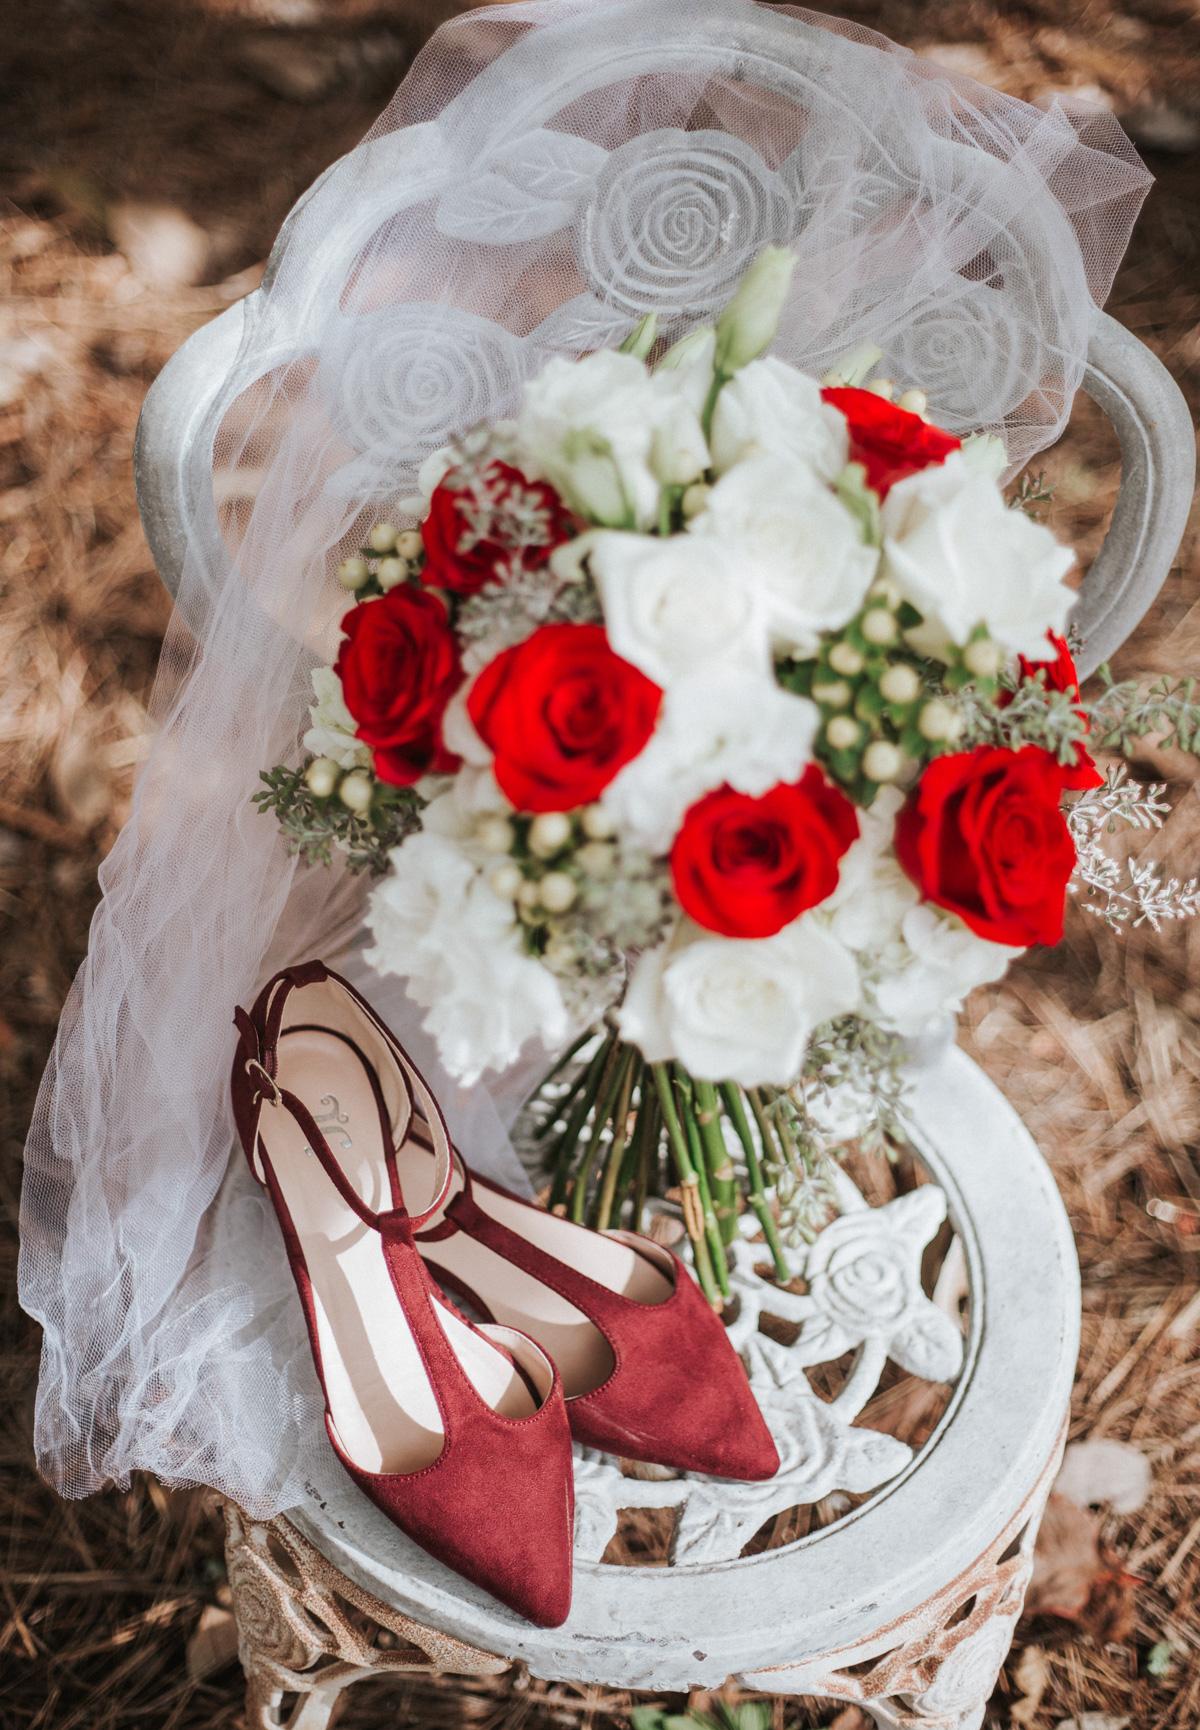 Bridal Shoes, Veil, and bouquet, Wedding Details  by Greensboro Winston-Salem Photographer   Kayli LaFon Photography